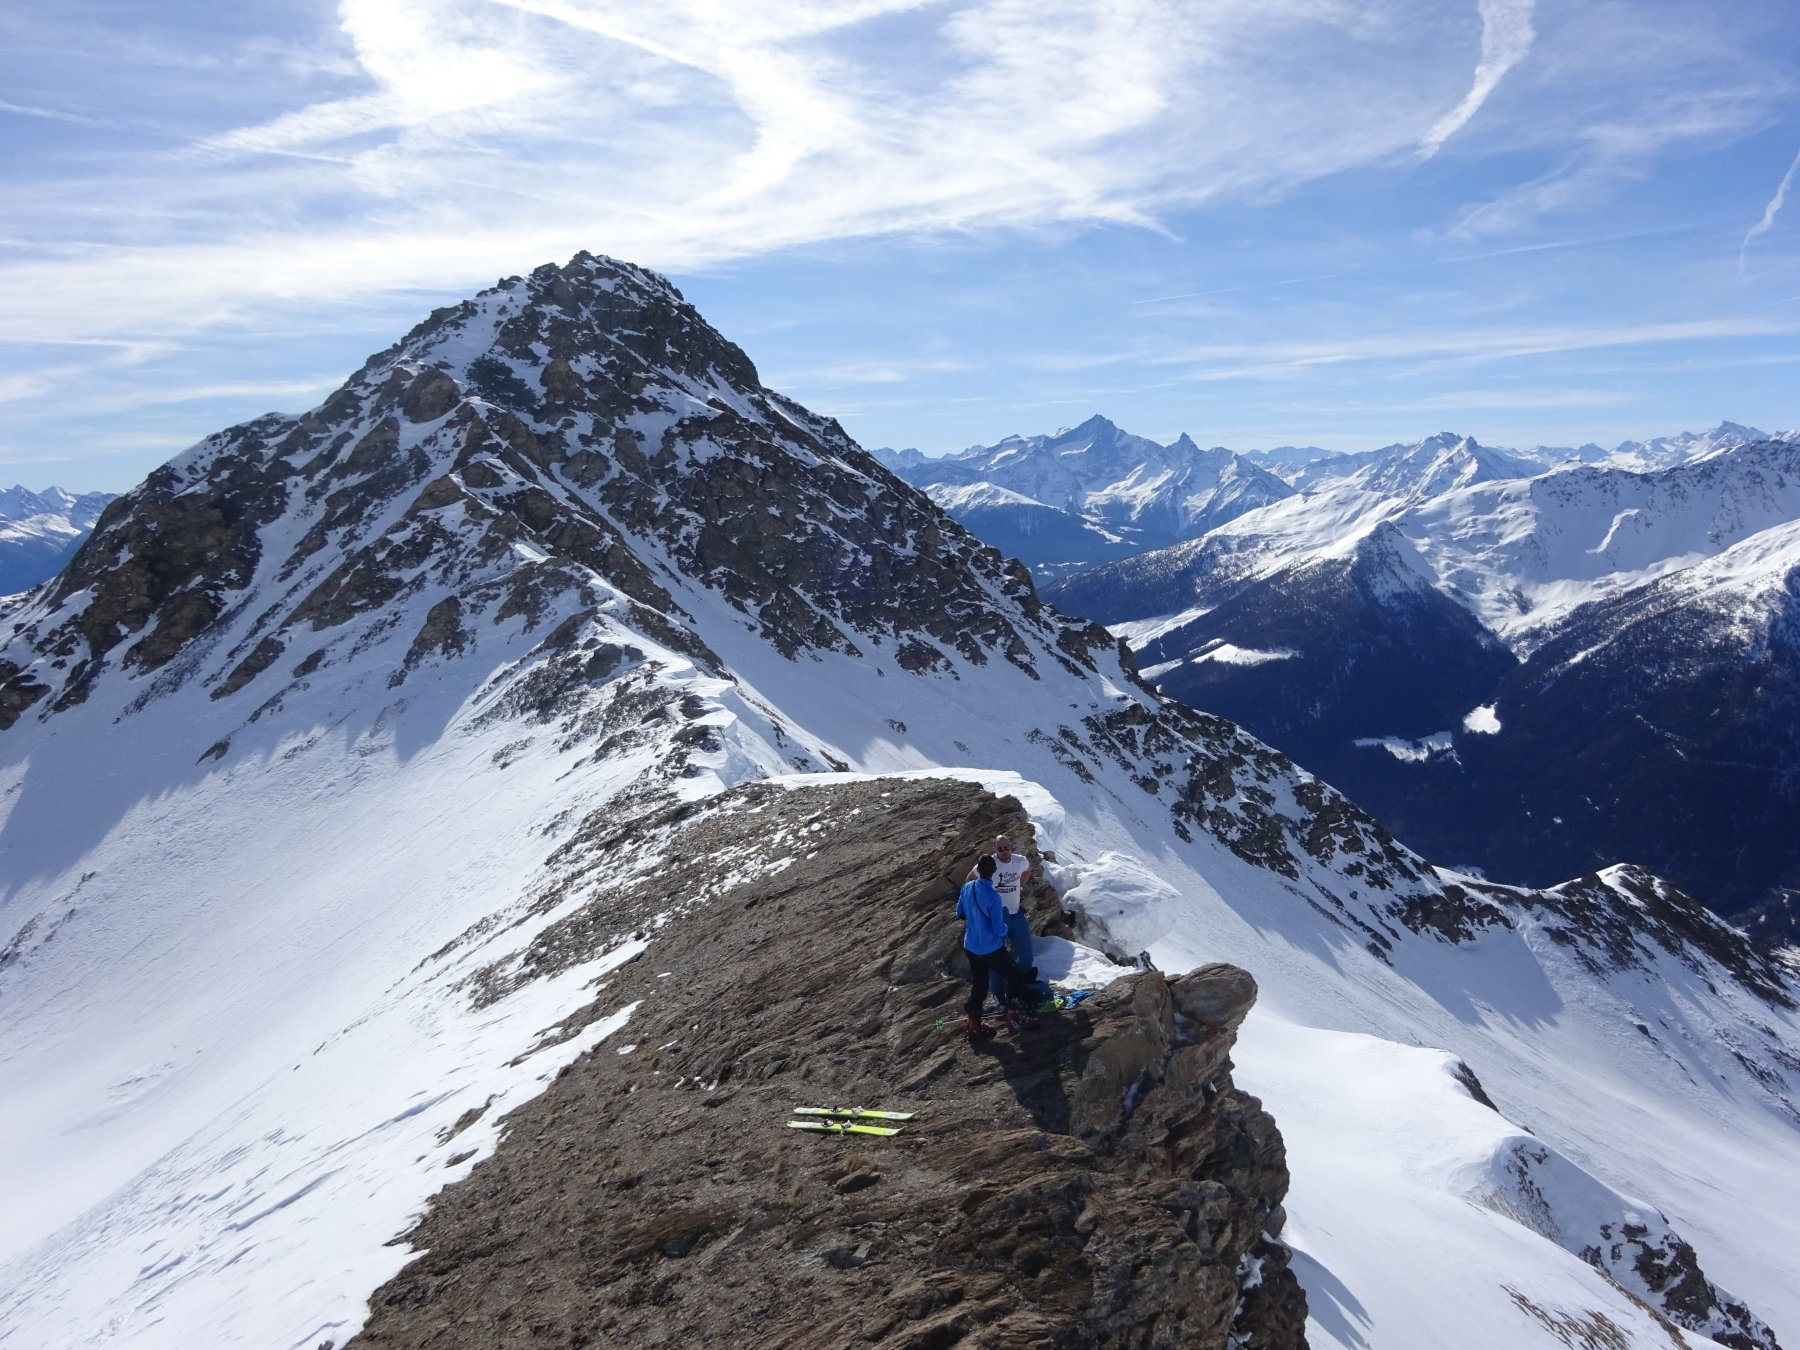 La nostra meta - cresta soprastante il Col du Champillon verso la Crou de Bleintse